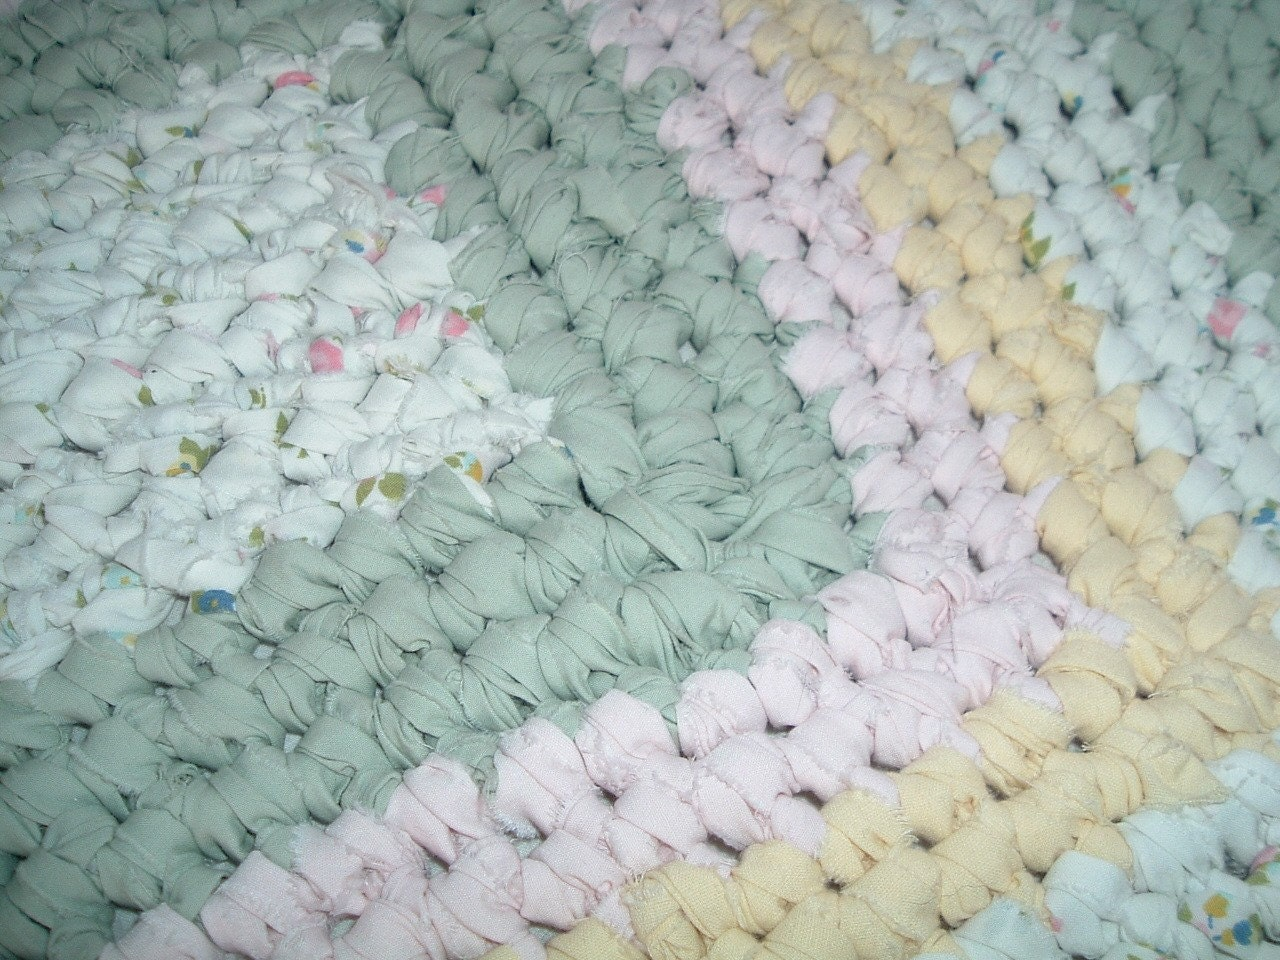 Free Crochet Patterns Rag Rugs : Crocheted Rectangular Shabby Chic Rag Rug Pinks Greens